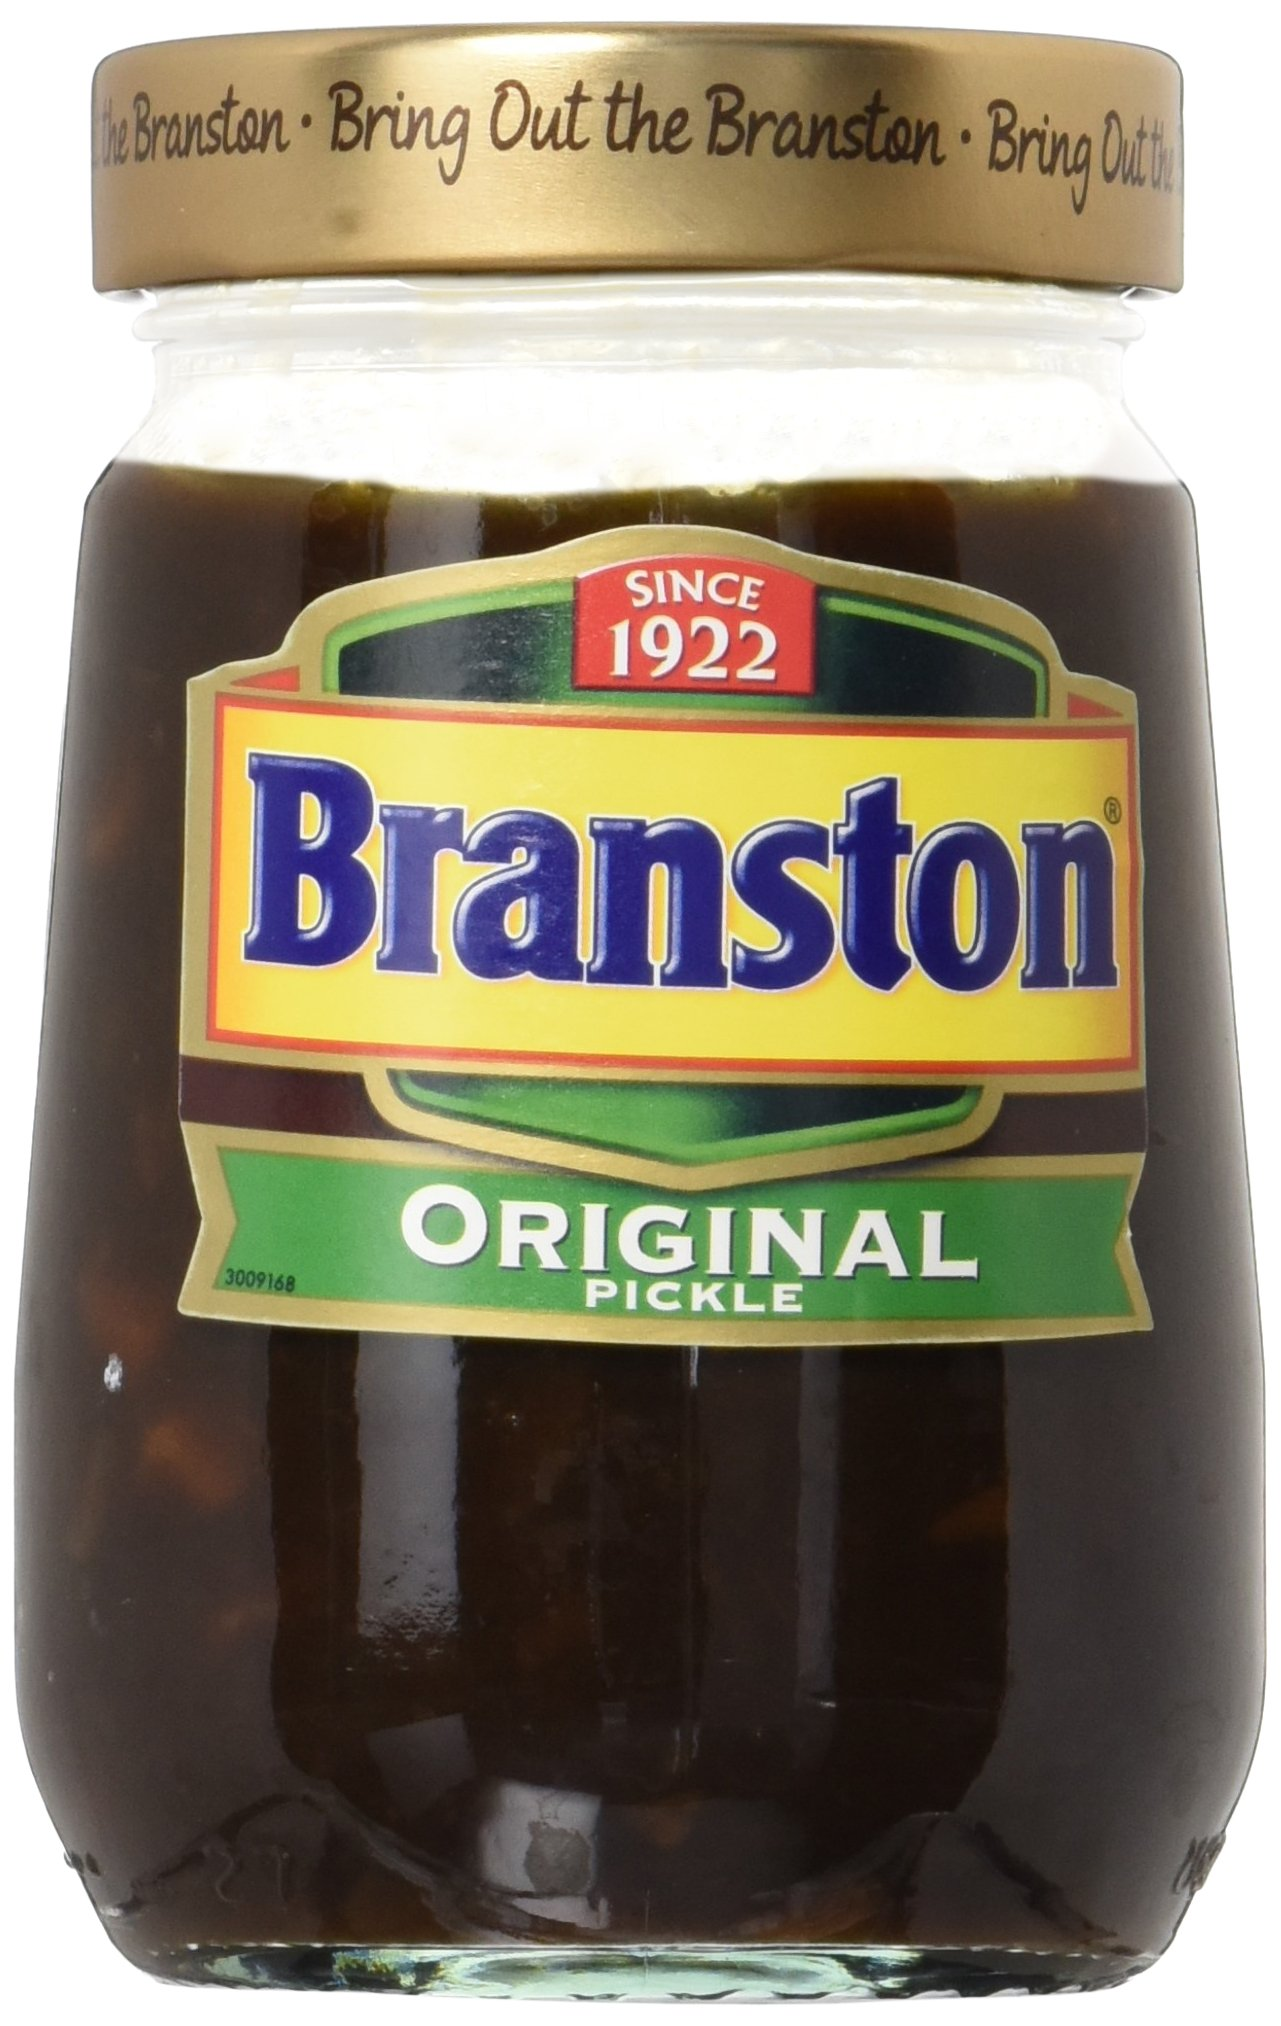 Branston Original Pickle (360g) - Pack of 2 by Branston